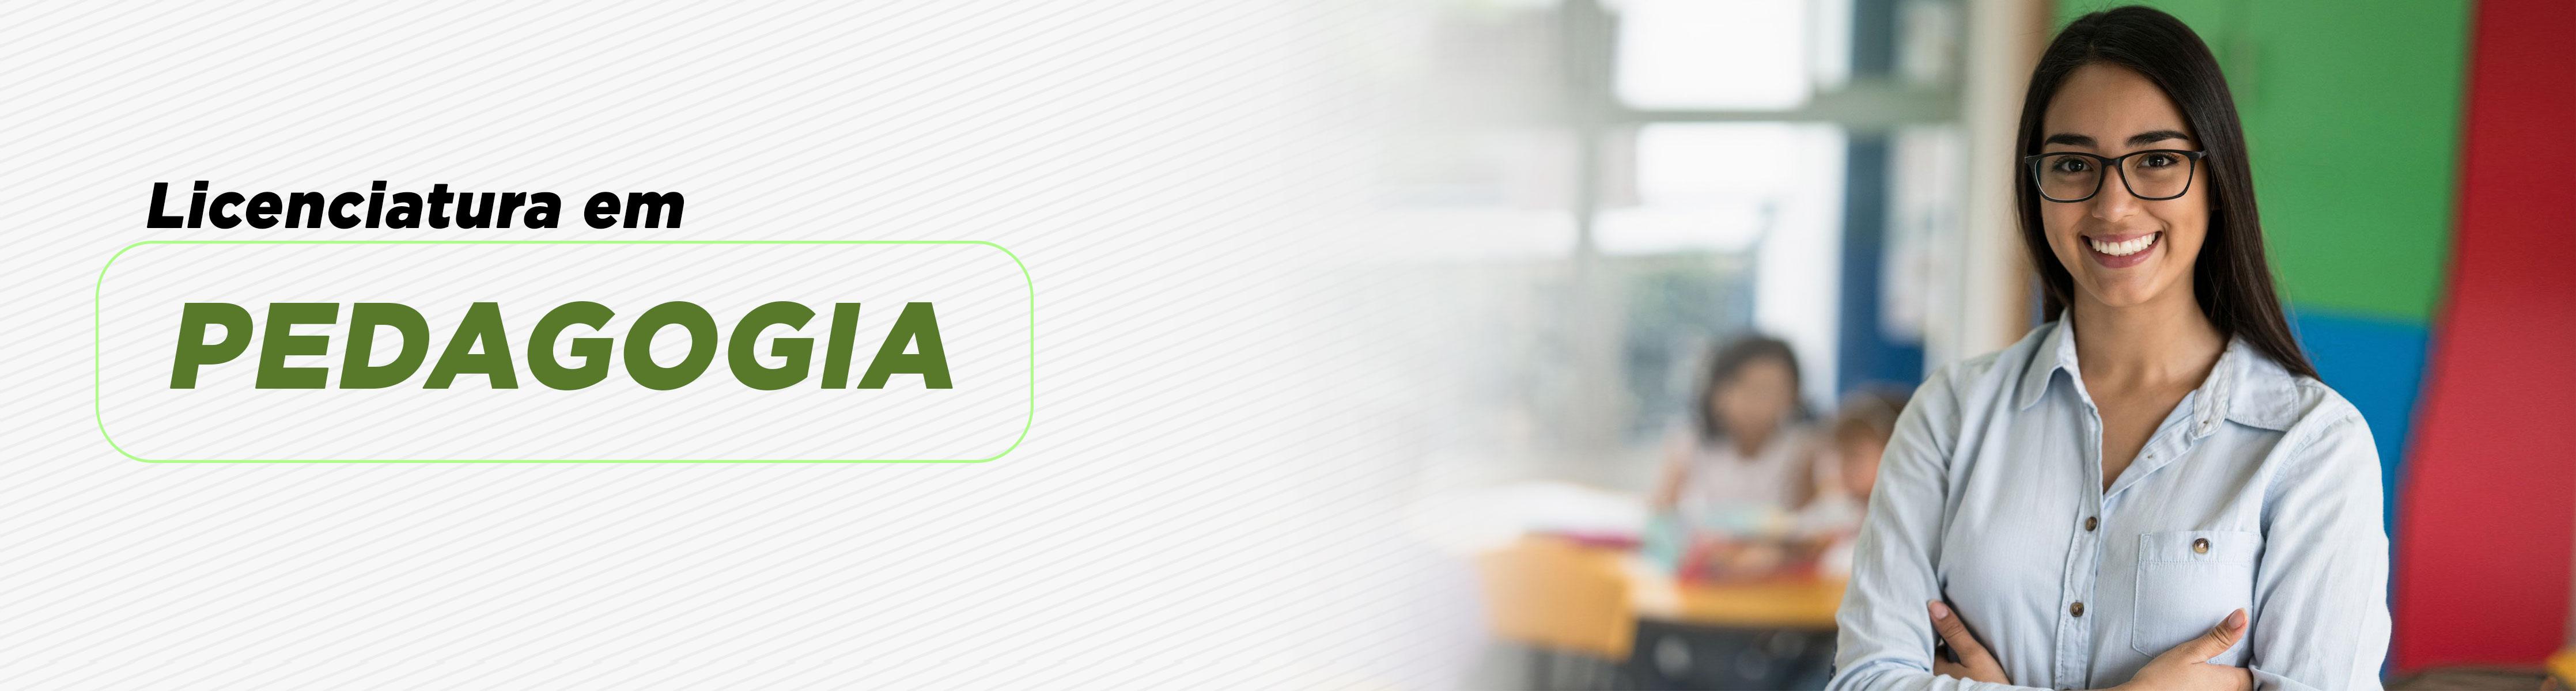 pedagogia-presencial-unifacear-2019